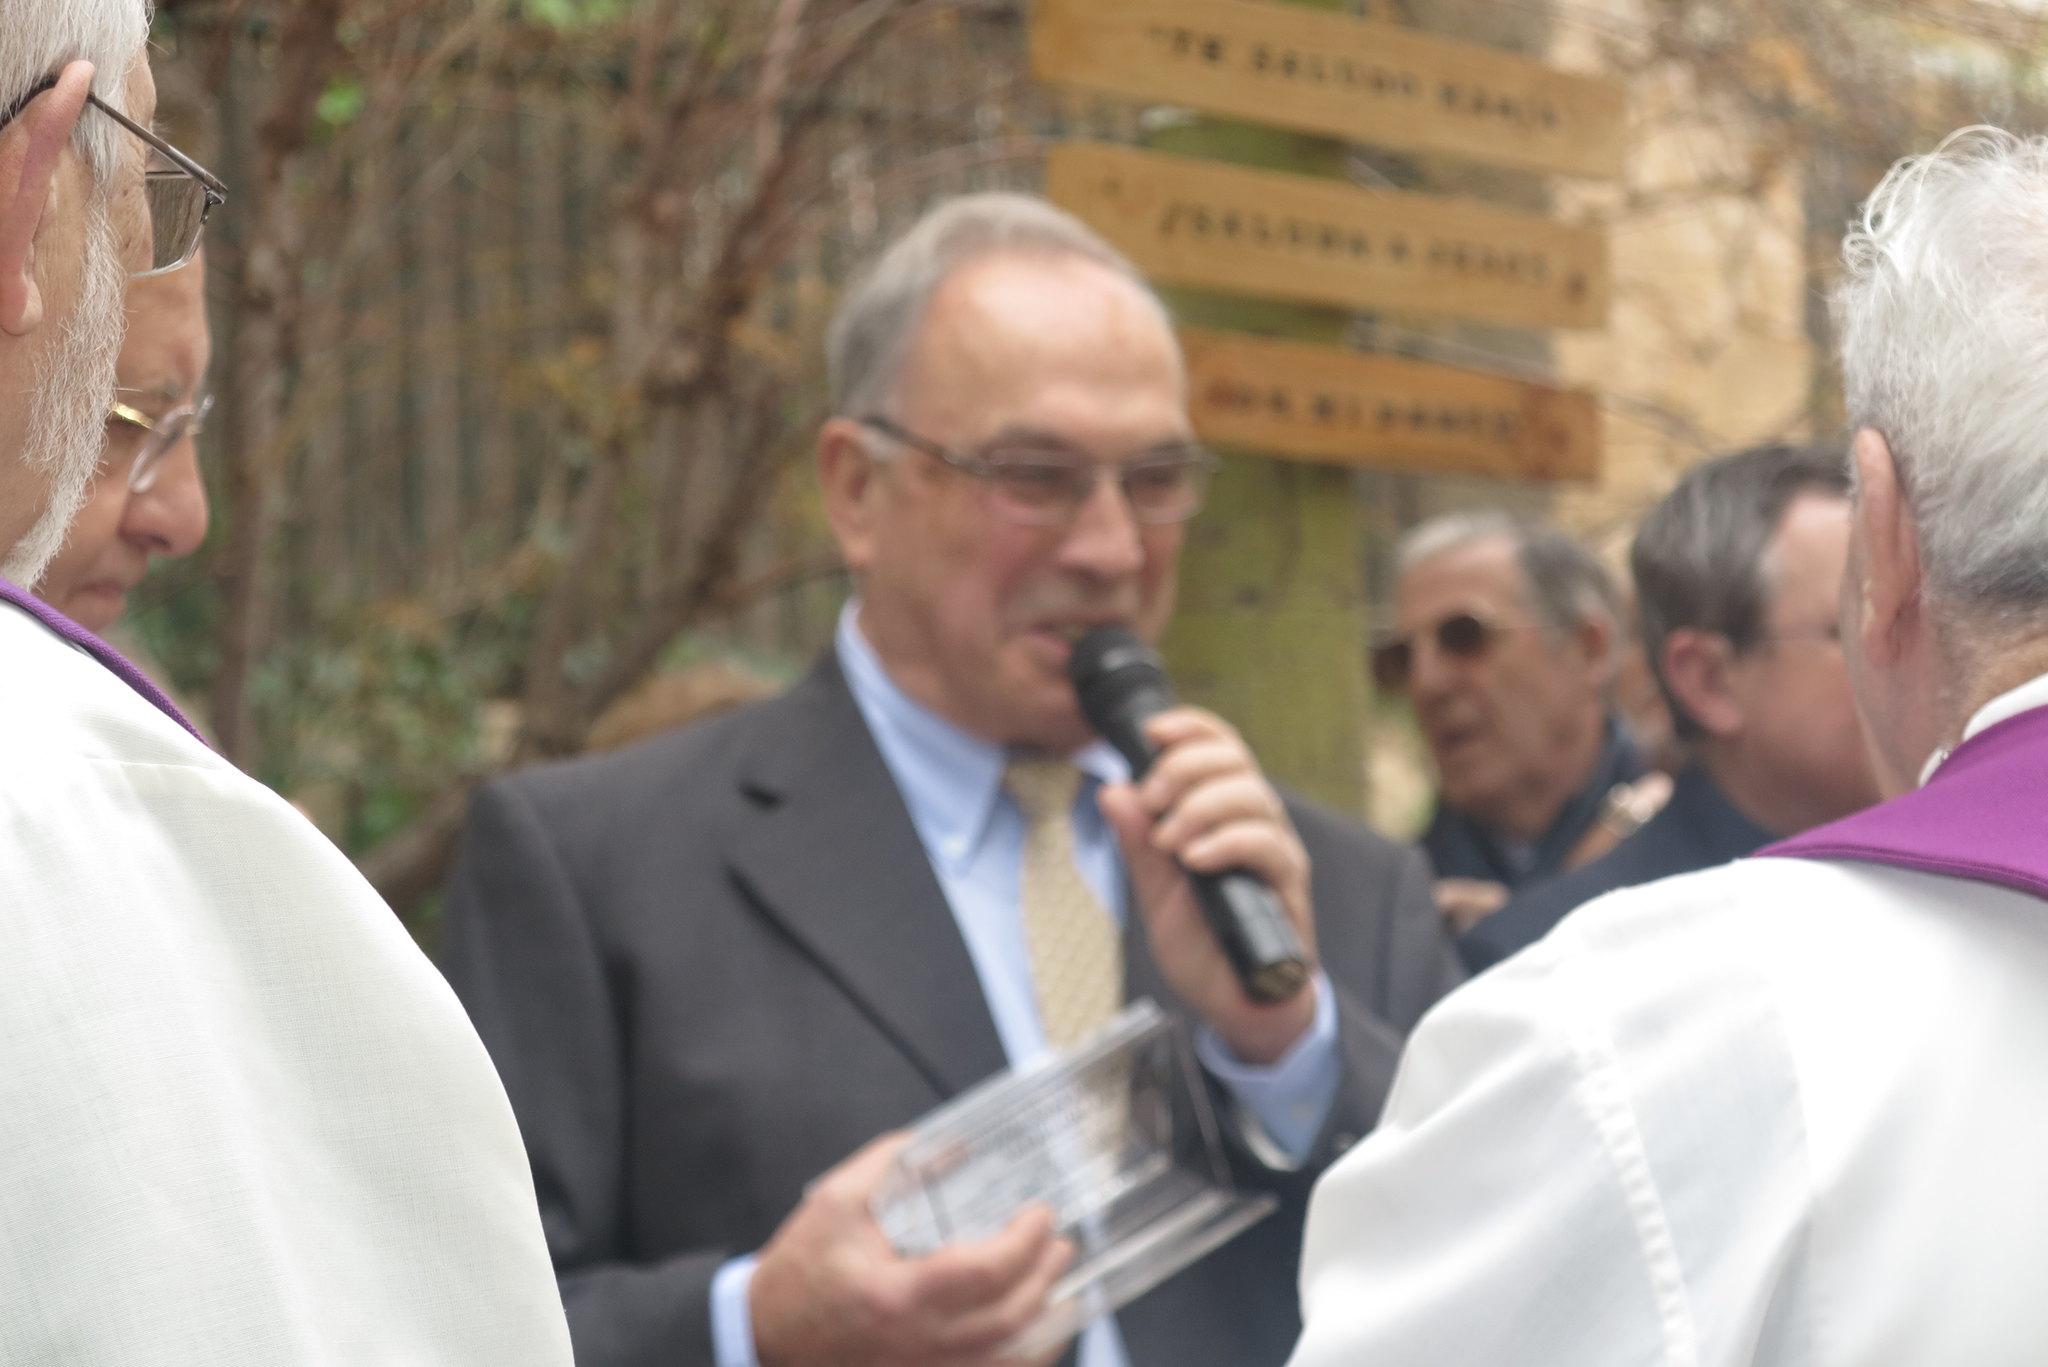 (2016-02-13) - Inauguración Virgen de Lourdes, La Molineta - Archivo La Molineta 2 (55)